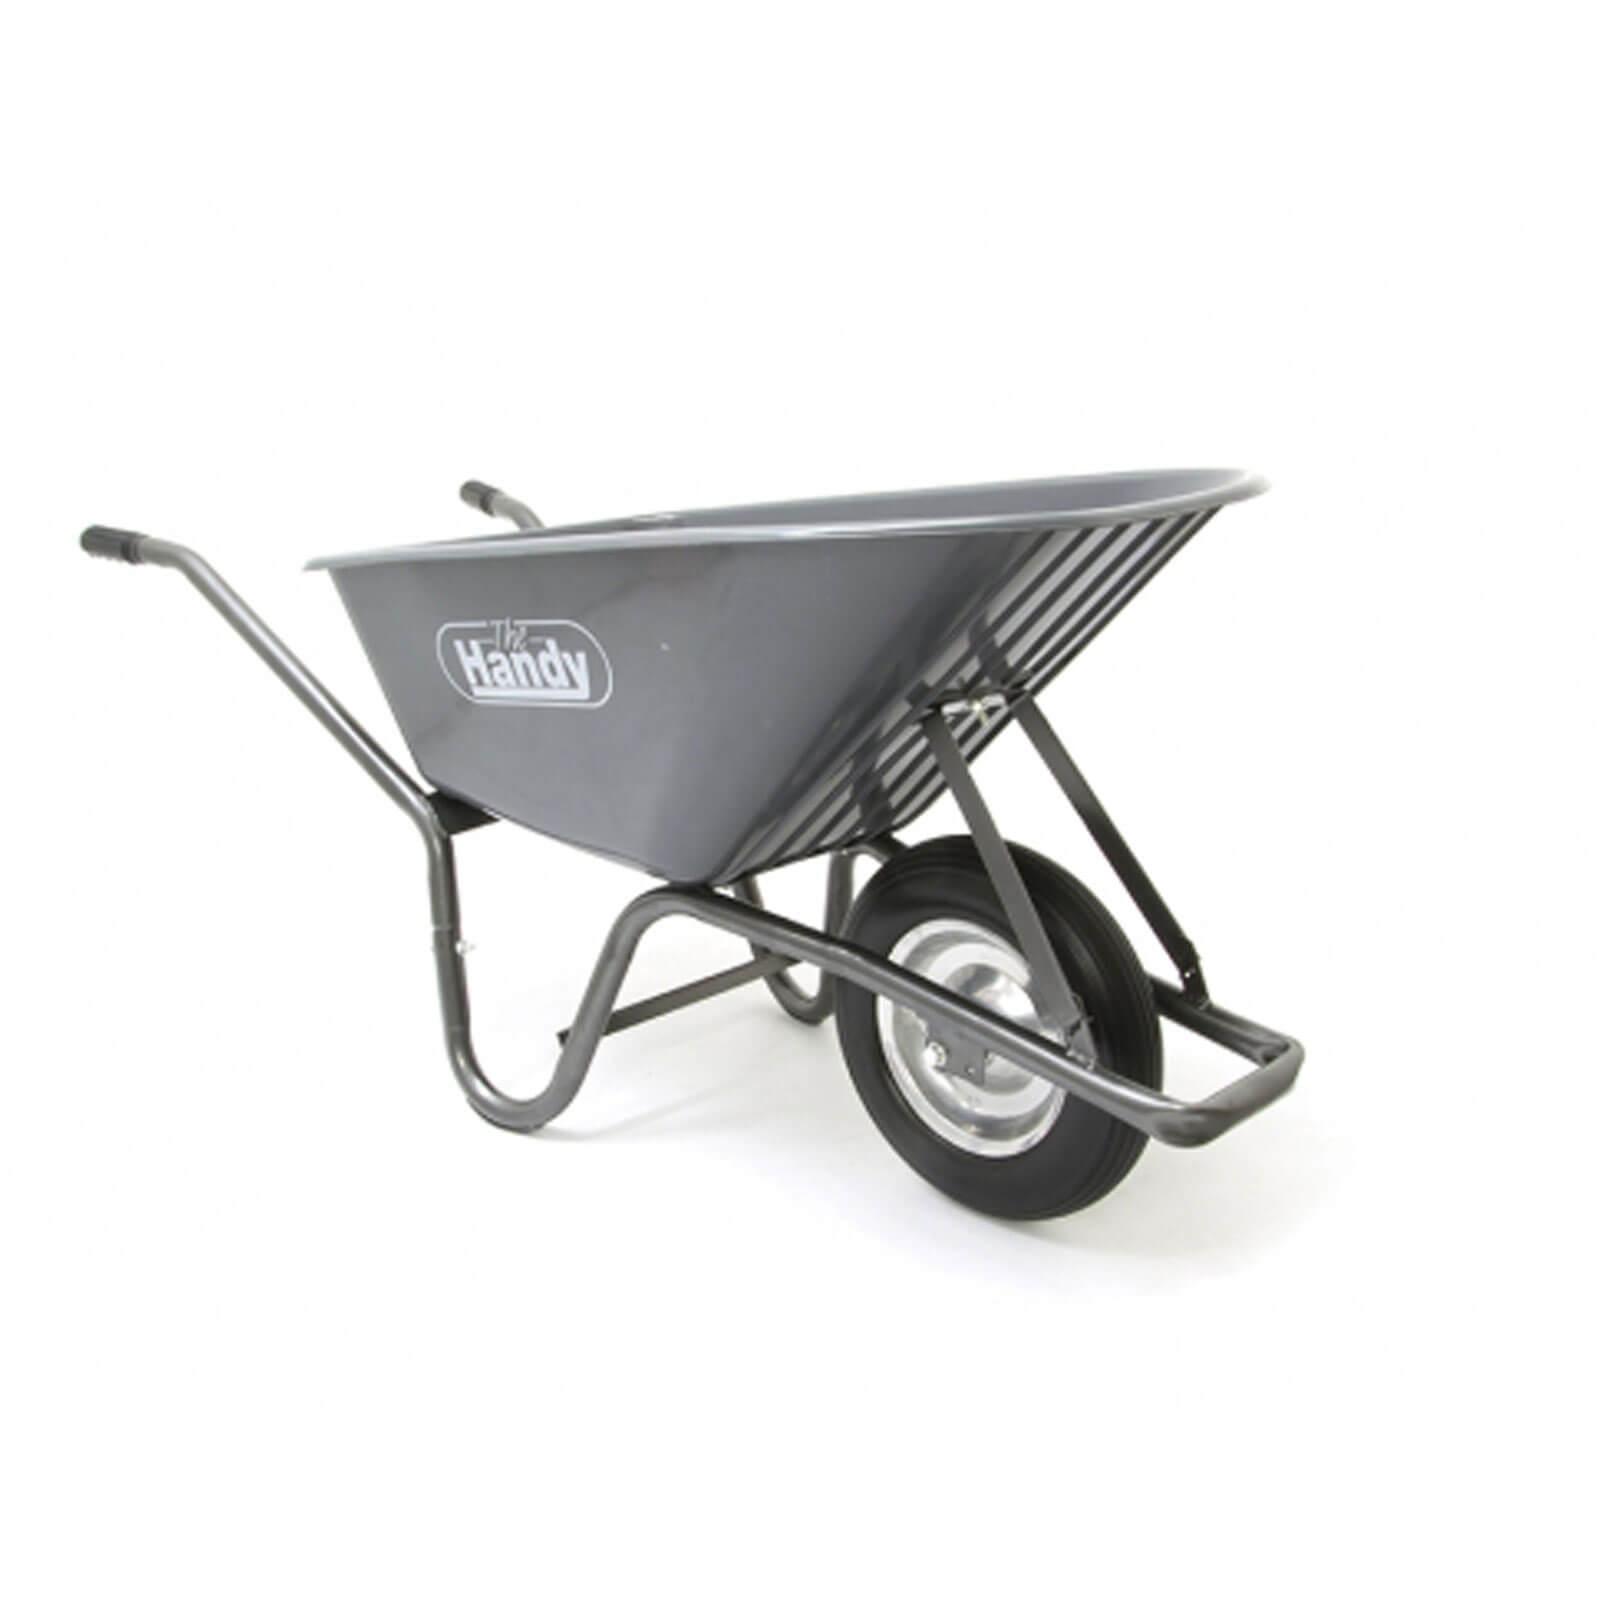 Handy Thwb90 Wheel Barrow With Punctureless Wheels 90l